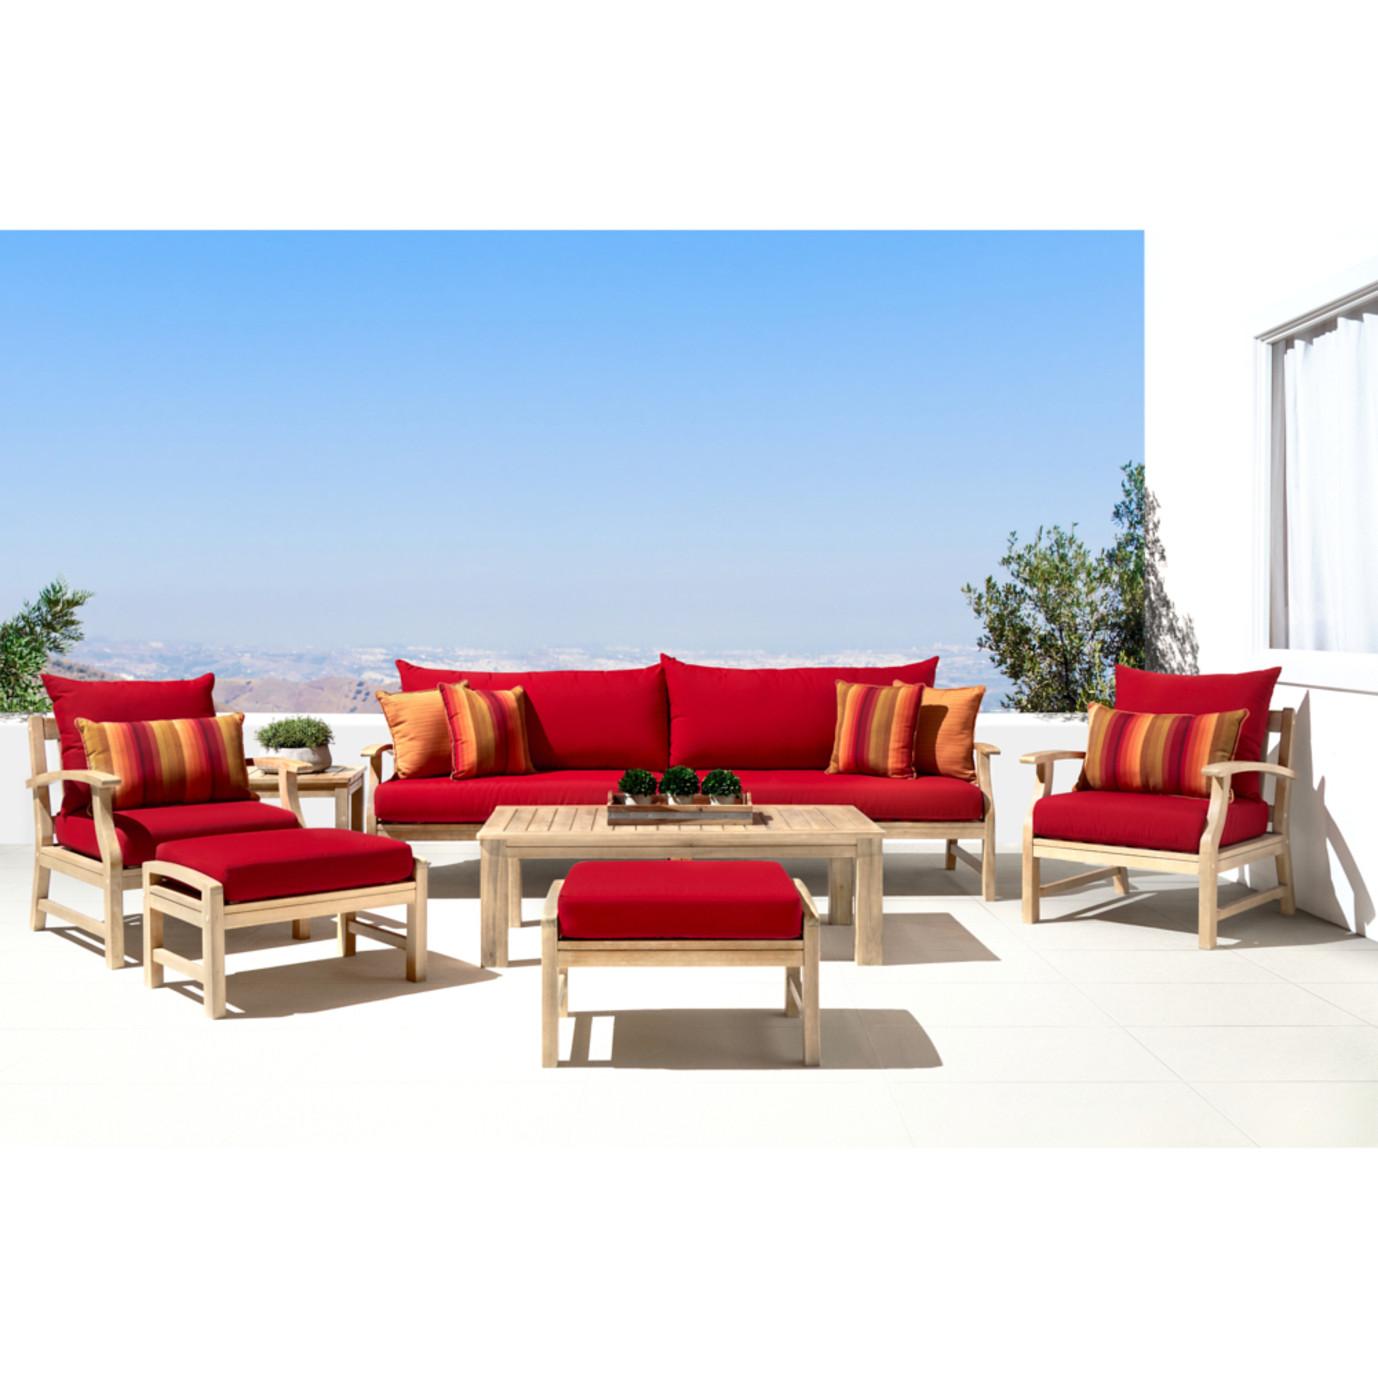 Kooper 8 Piece Sofa & Club Chair Set - Sunset Red